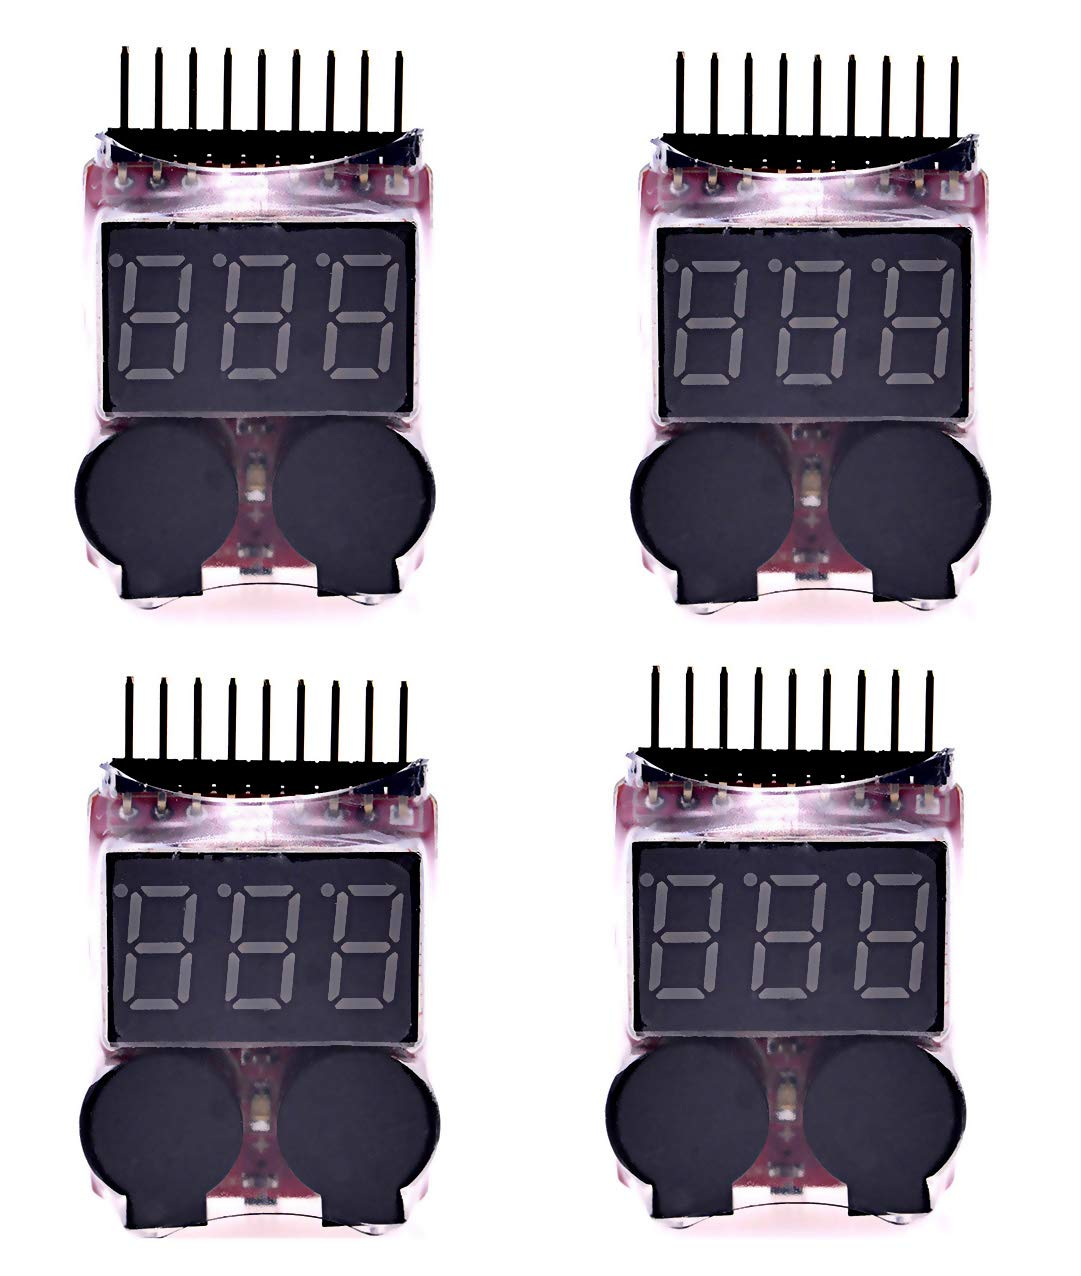 Readytosky Lipo Battery Voltage Tester Low Voltage Buzzer Alarm for 2-8S Lipo Life LiMn Li-ion Battery Checker Monitor(4PCS)